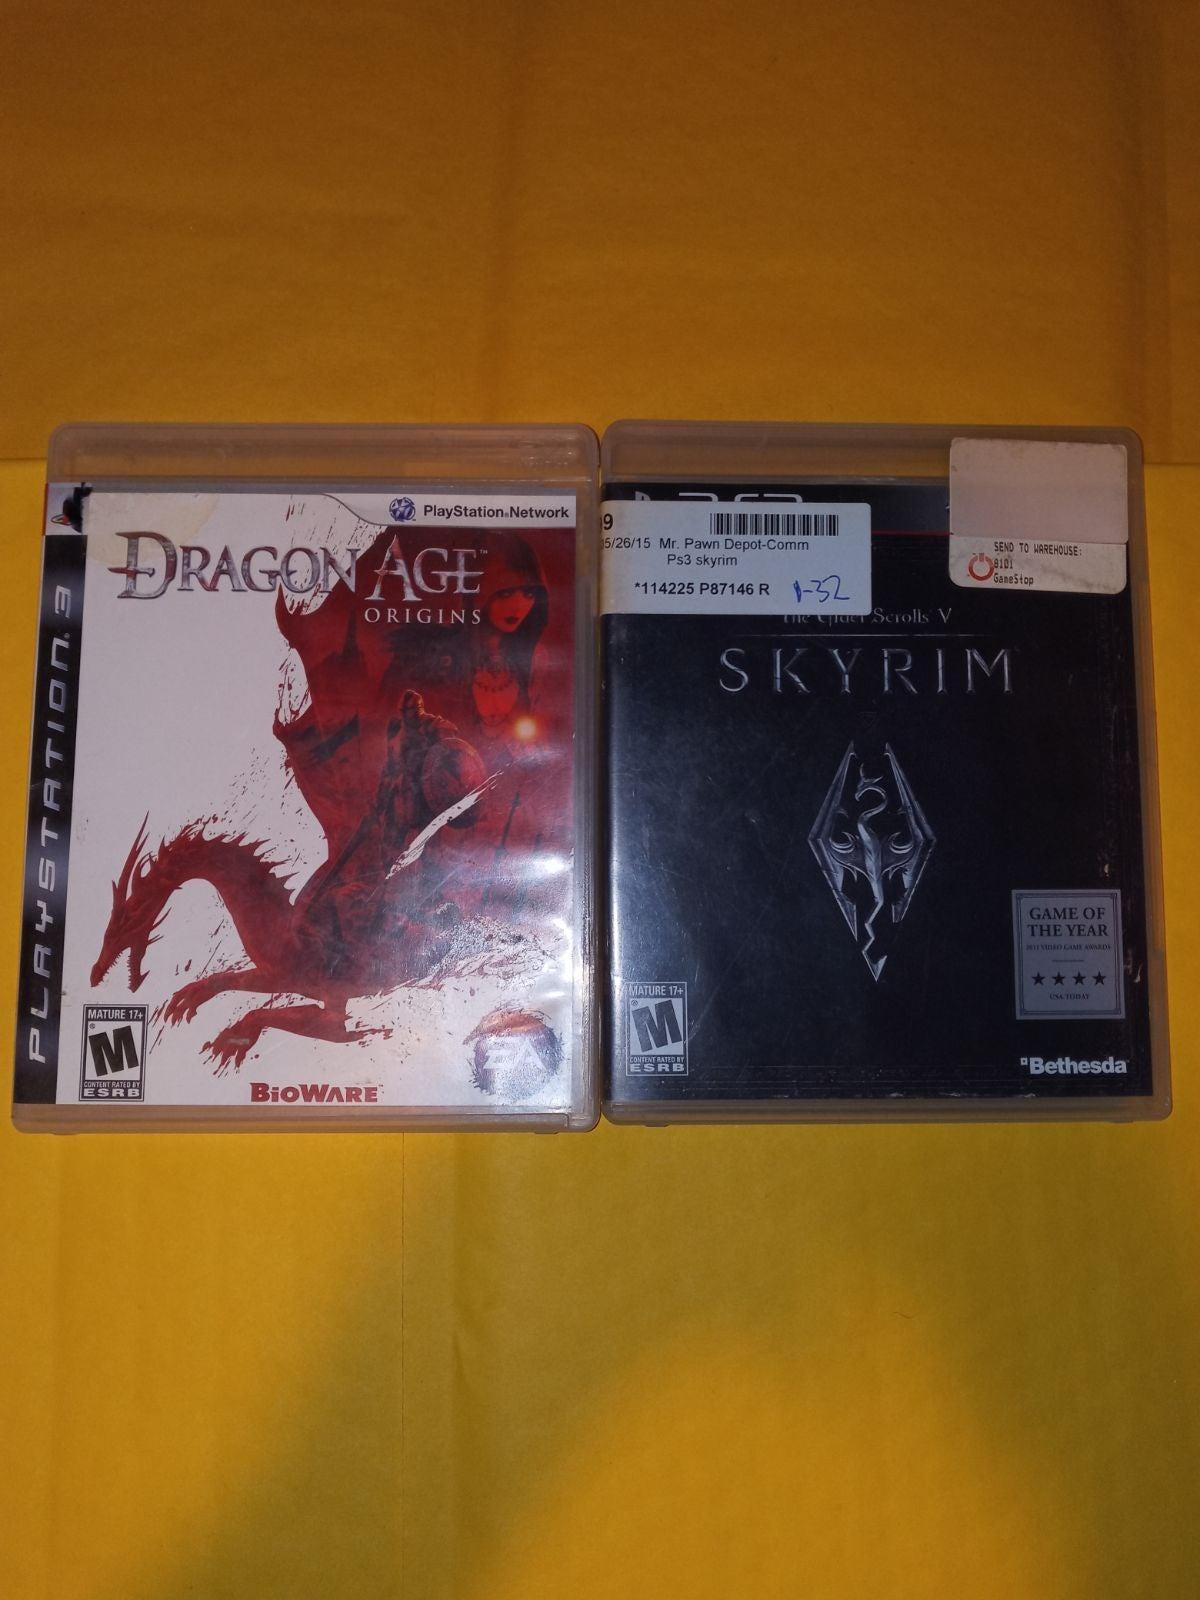 Dragon Age: Origins & Skyrim On Ps3